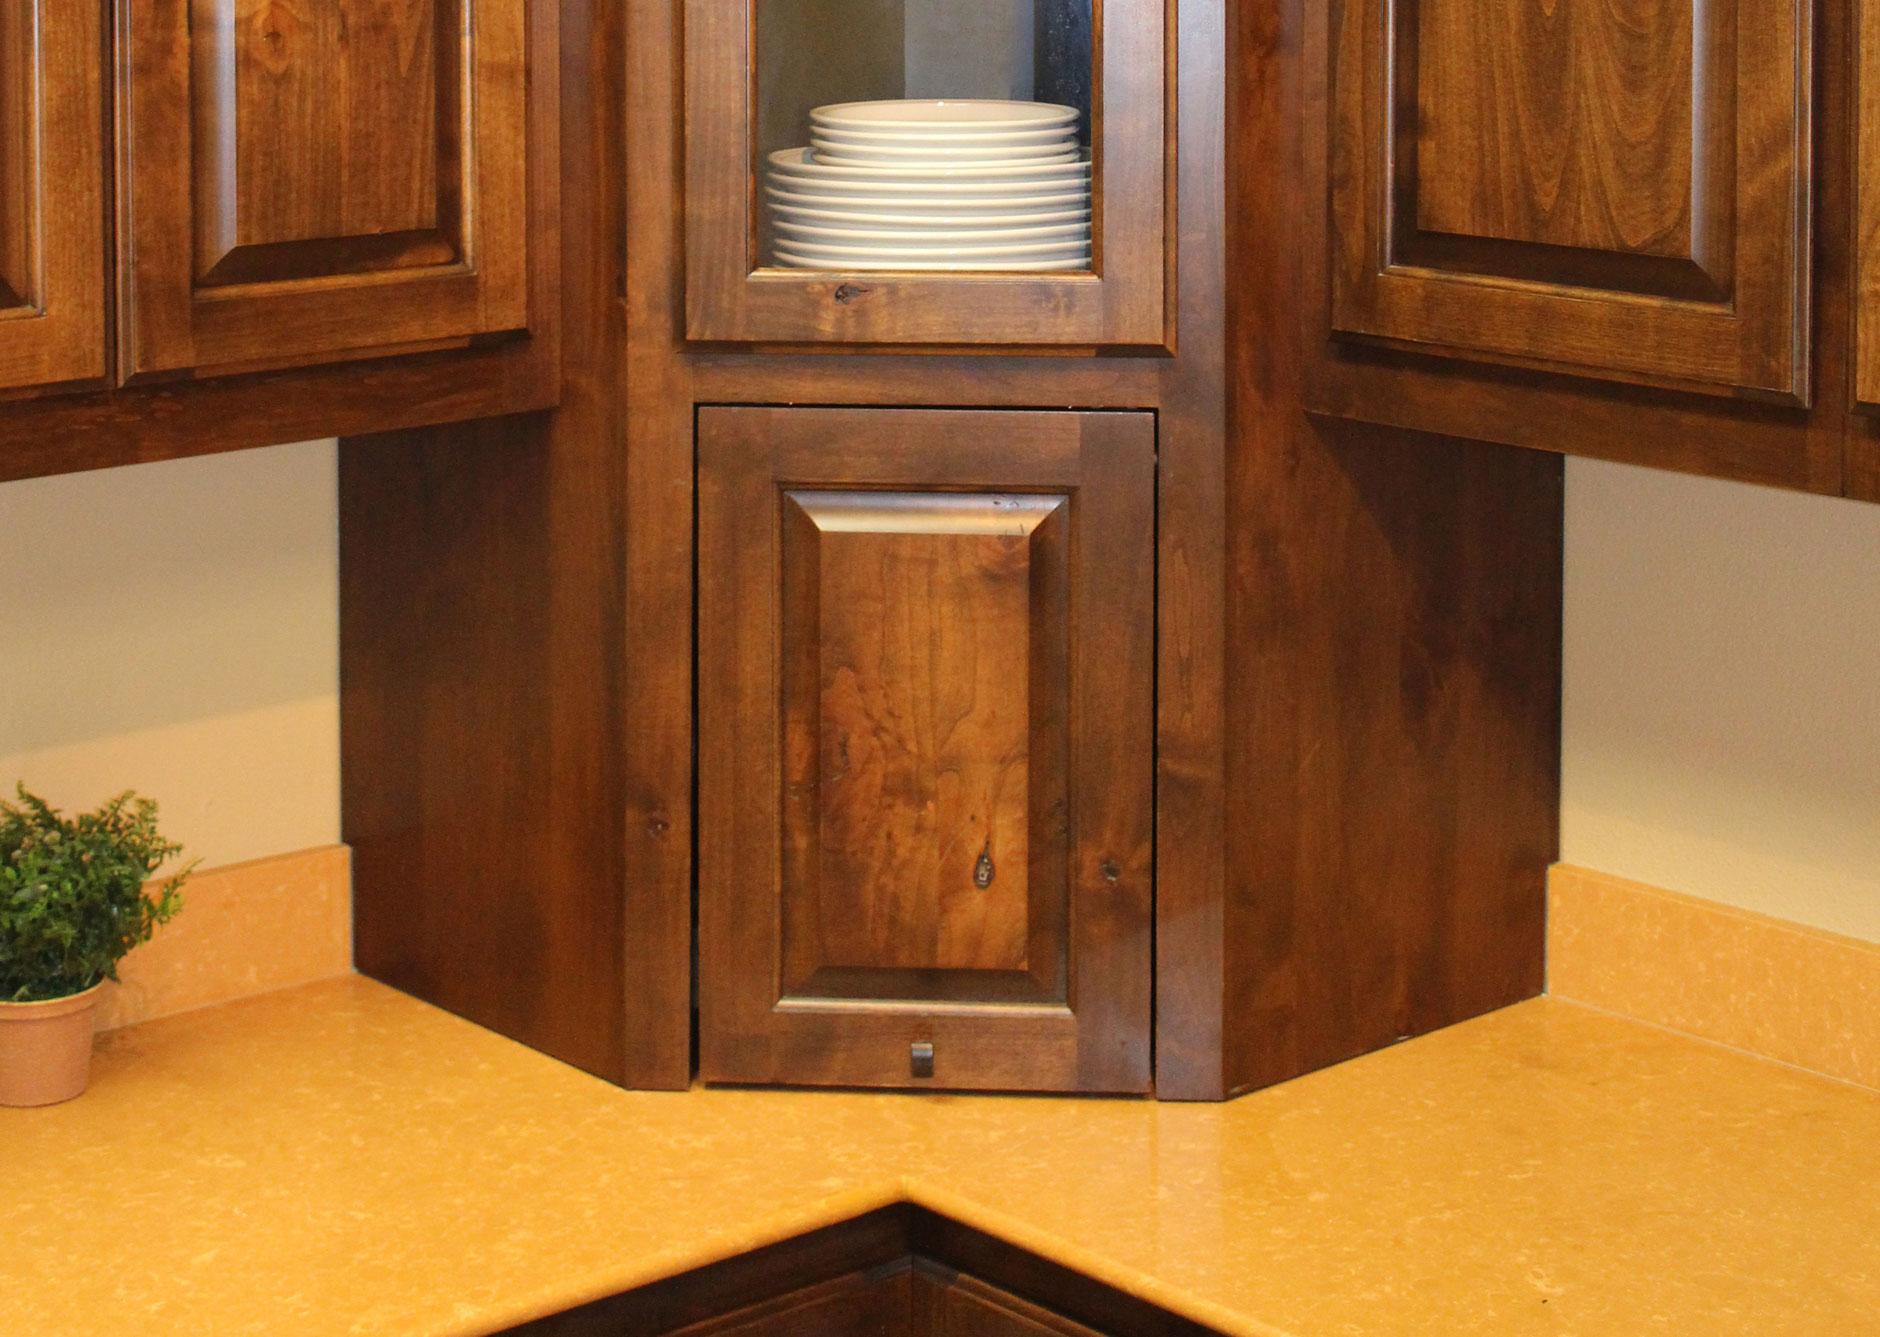 Appliance Garage Corner Burrows Cabinets Central Texas Builder Direct Custom Cabinets